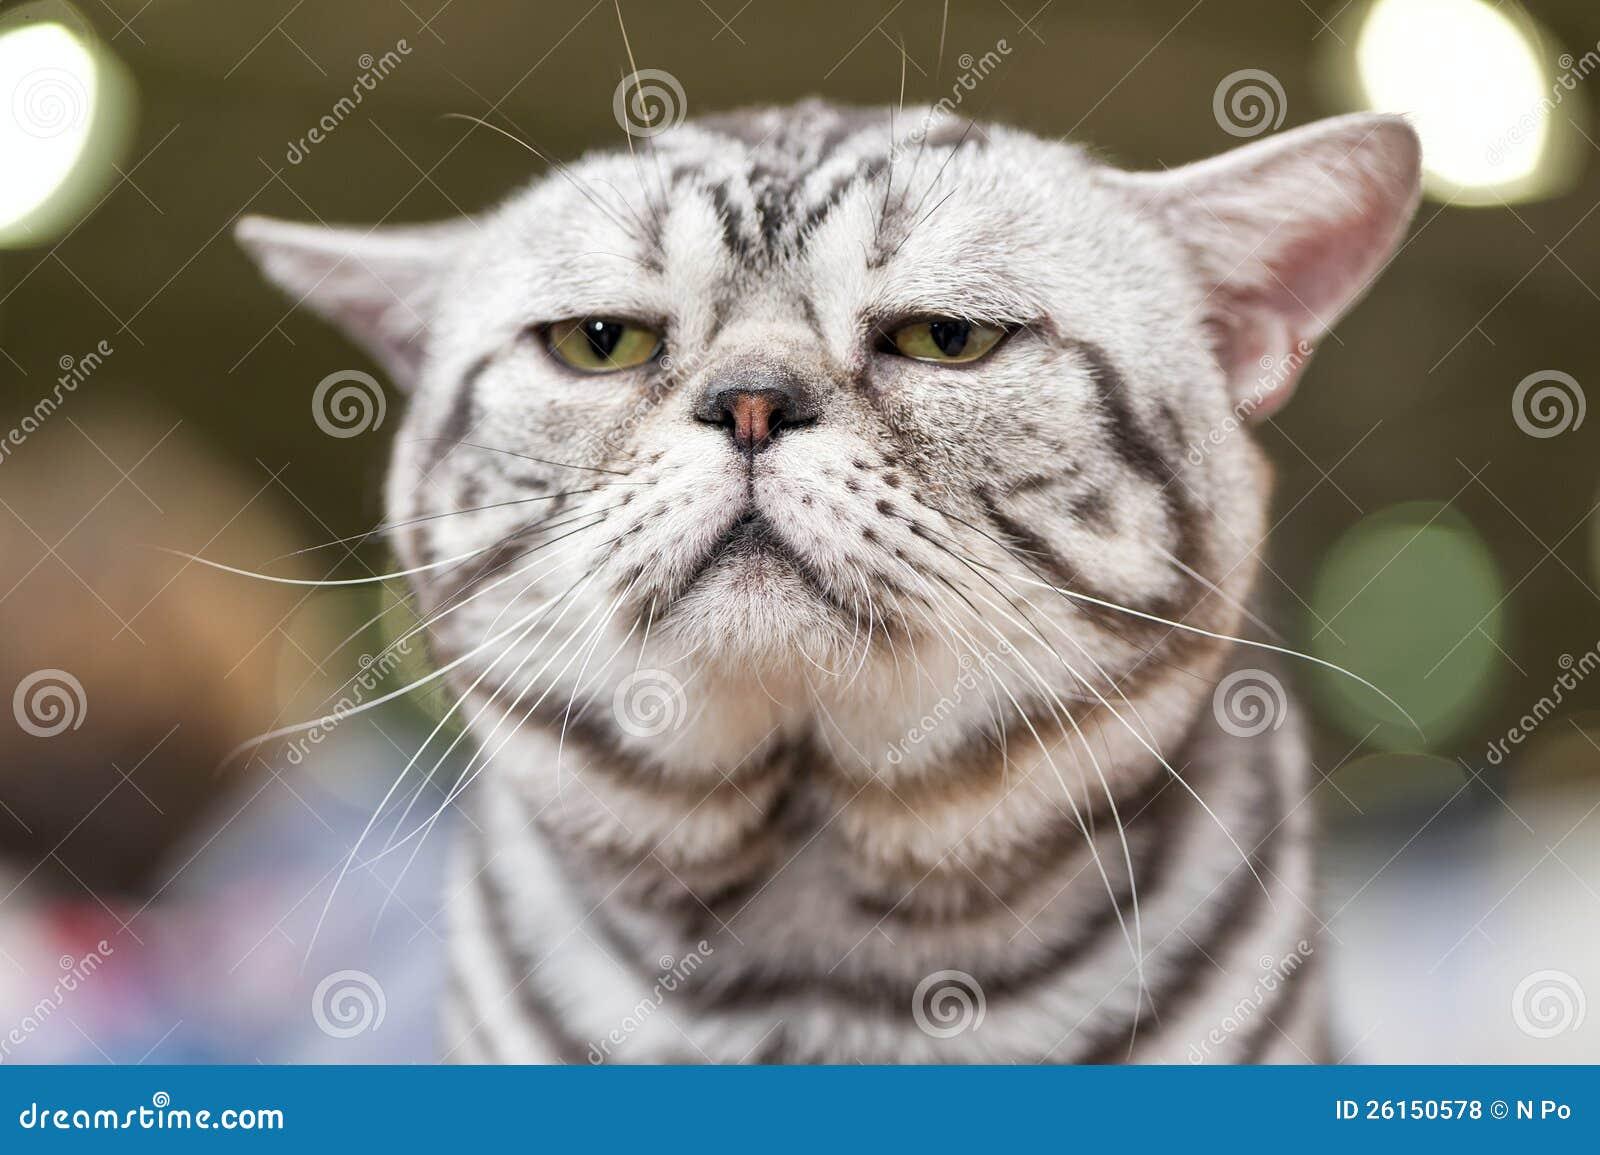 American Short Hair Cat Close Up At Cat Show Royalty Free